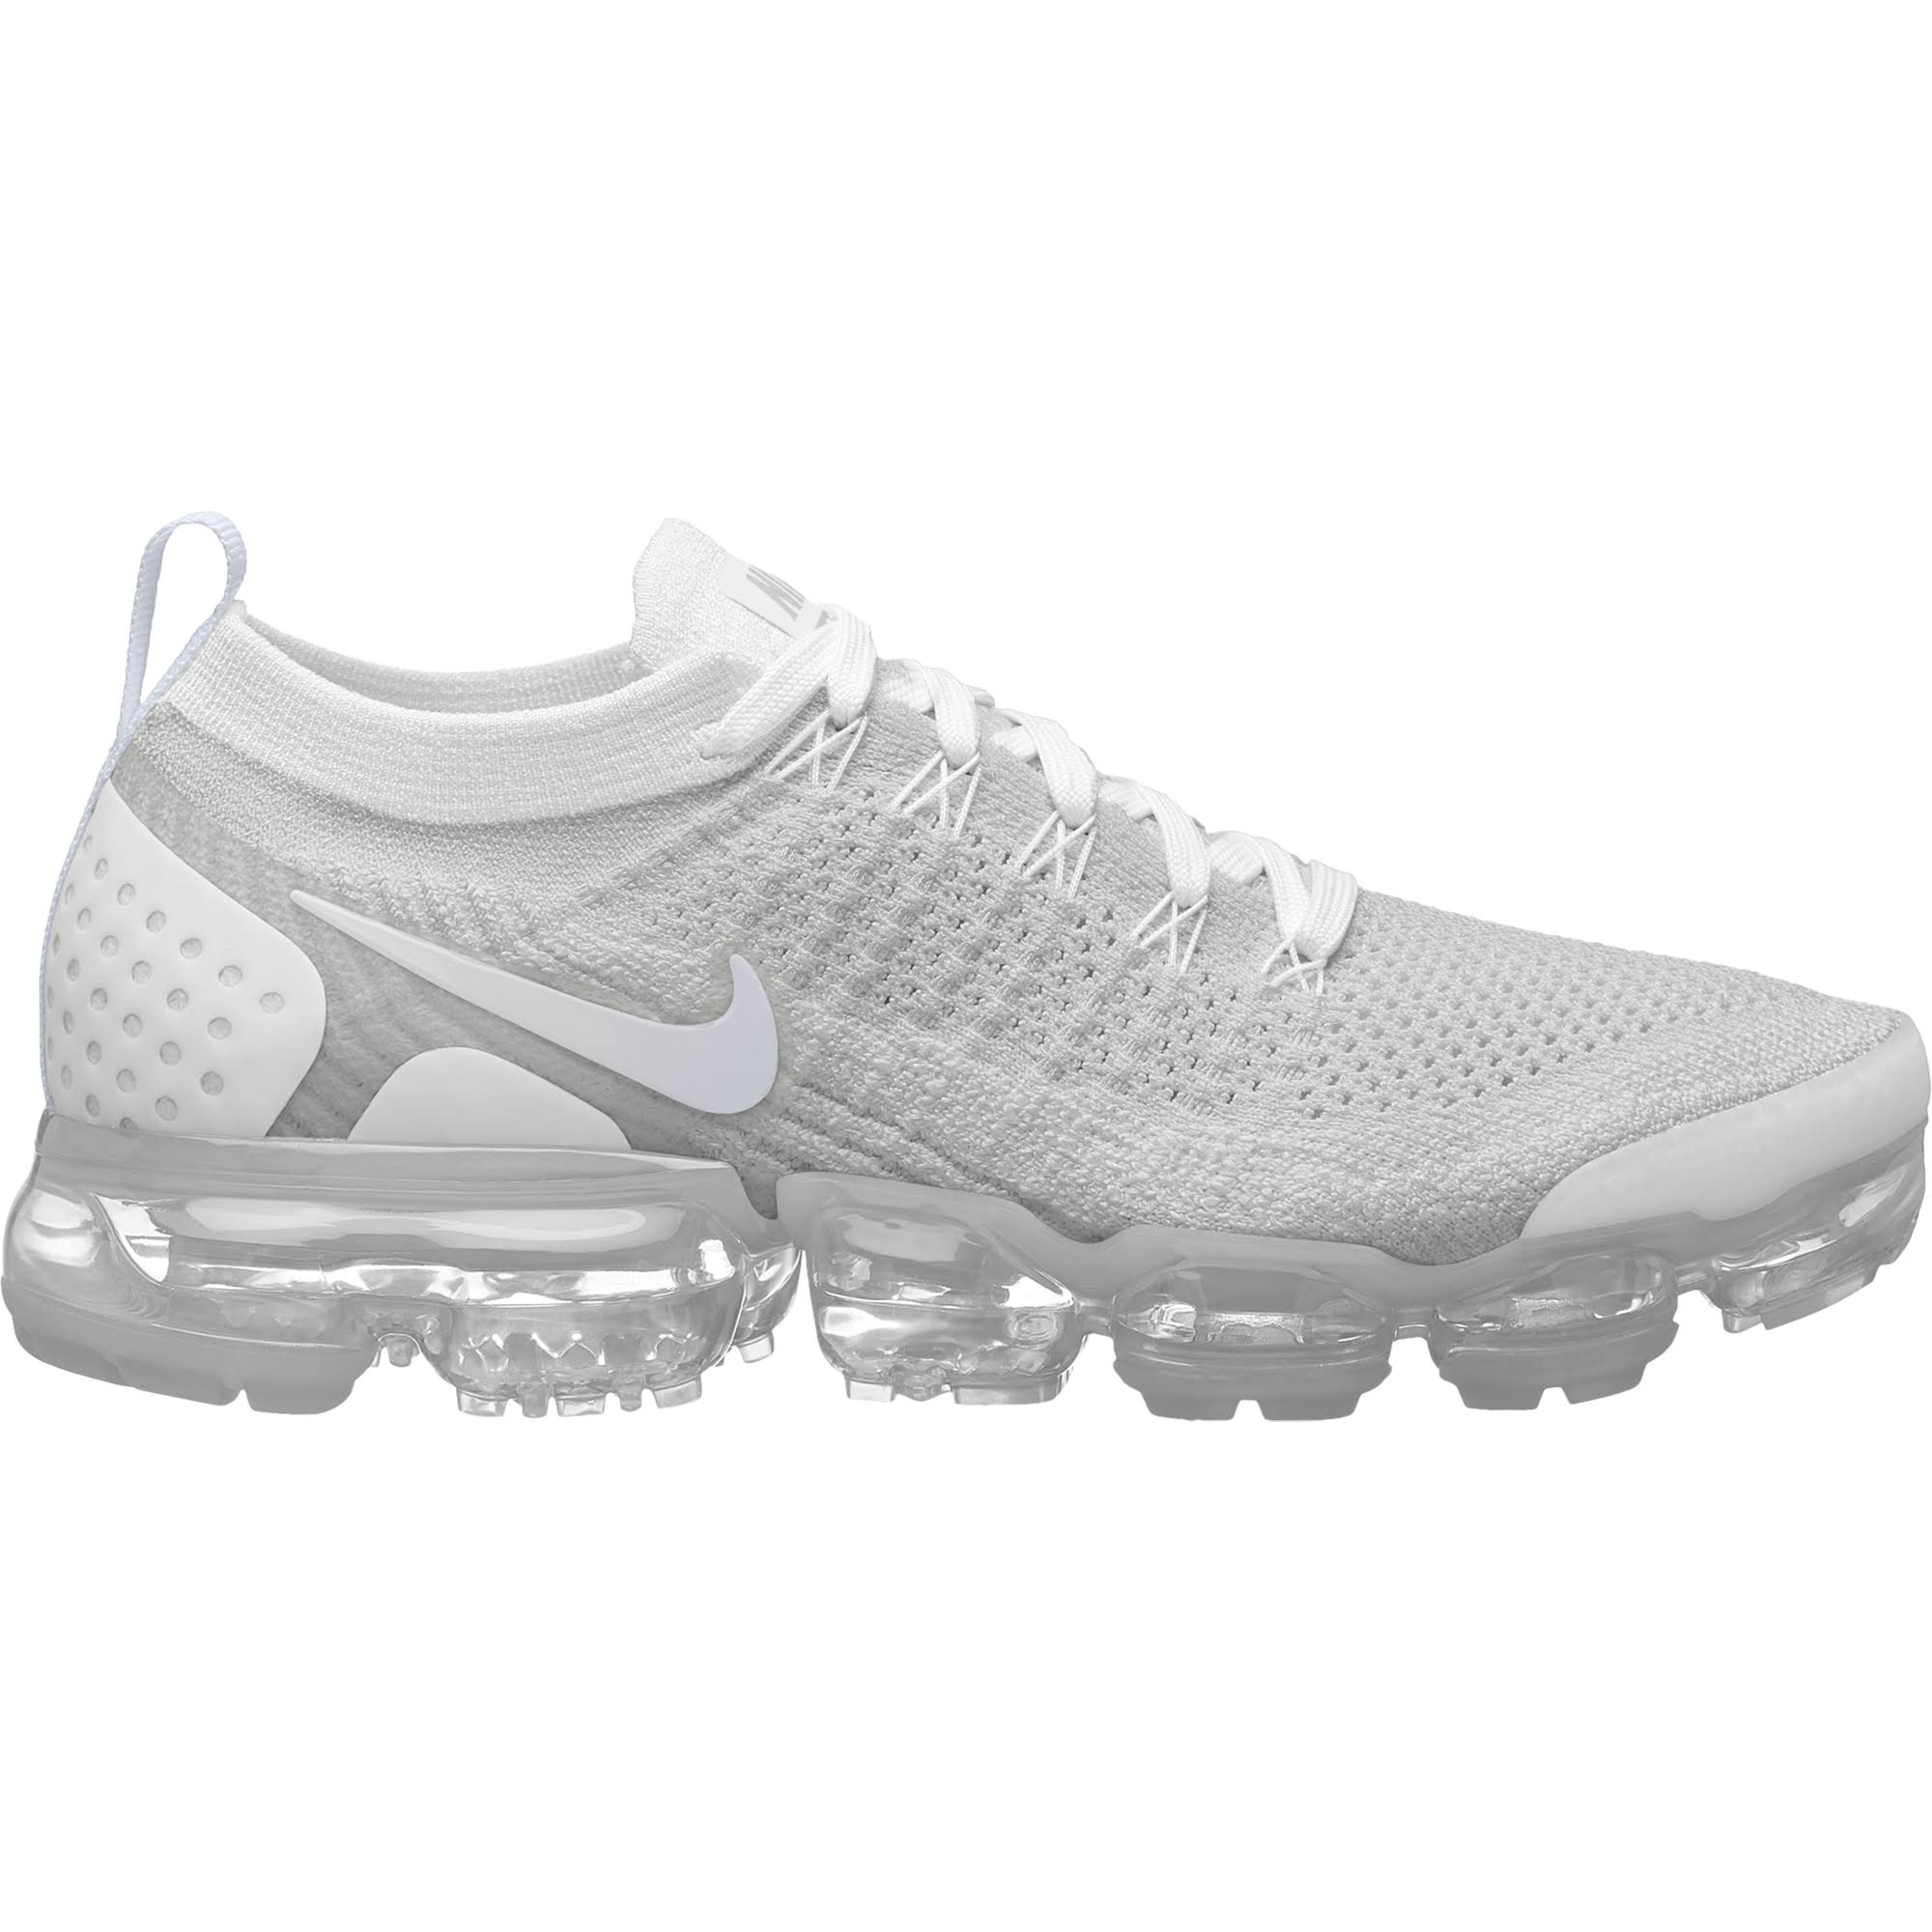 Tamaño Flyknit Nike 6 5 Running Zapatillas De Air Vapormax 942843105 Para Mujer 2 qRwEwSvf